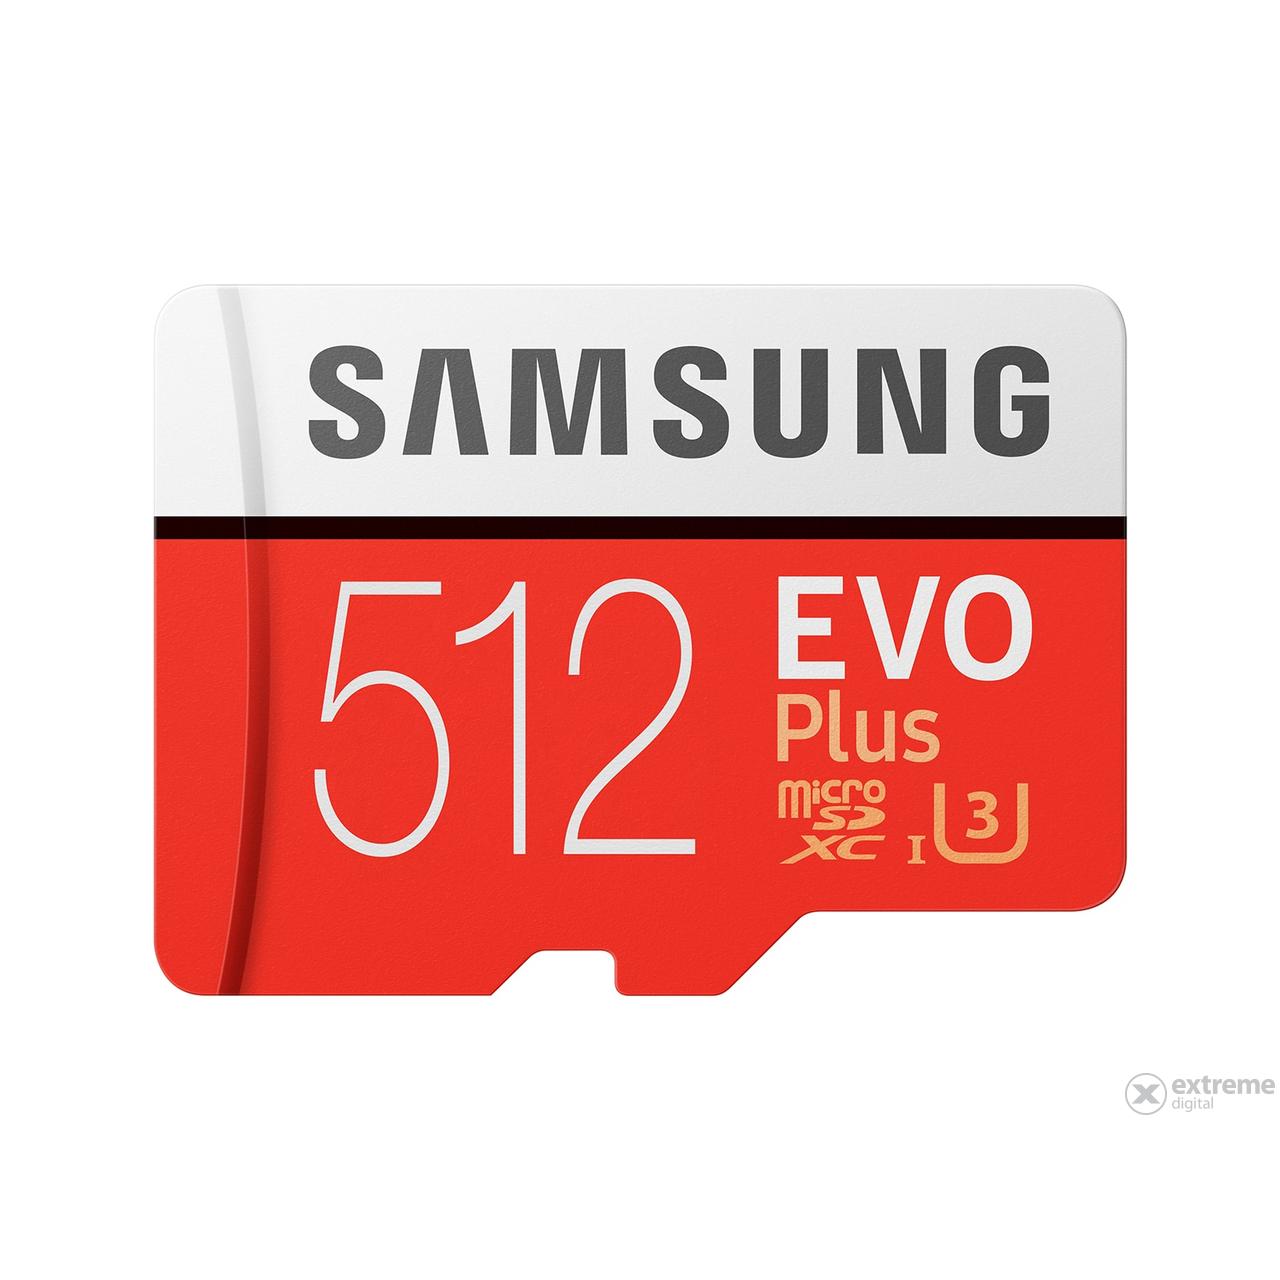 Samsung EVO Plus 512GB microSDXC UHS-I U3 100MB/s Full HD & 4K UHD Memóriakártya adapterrel (MB-MC512GA)